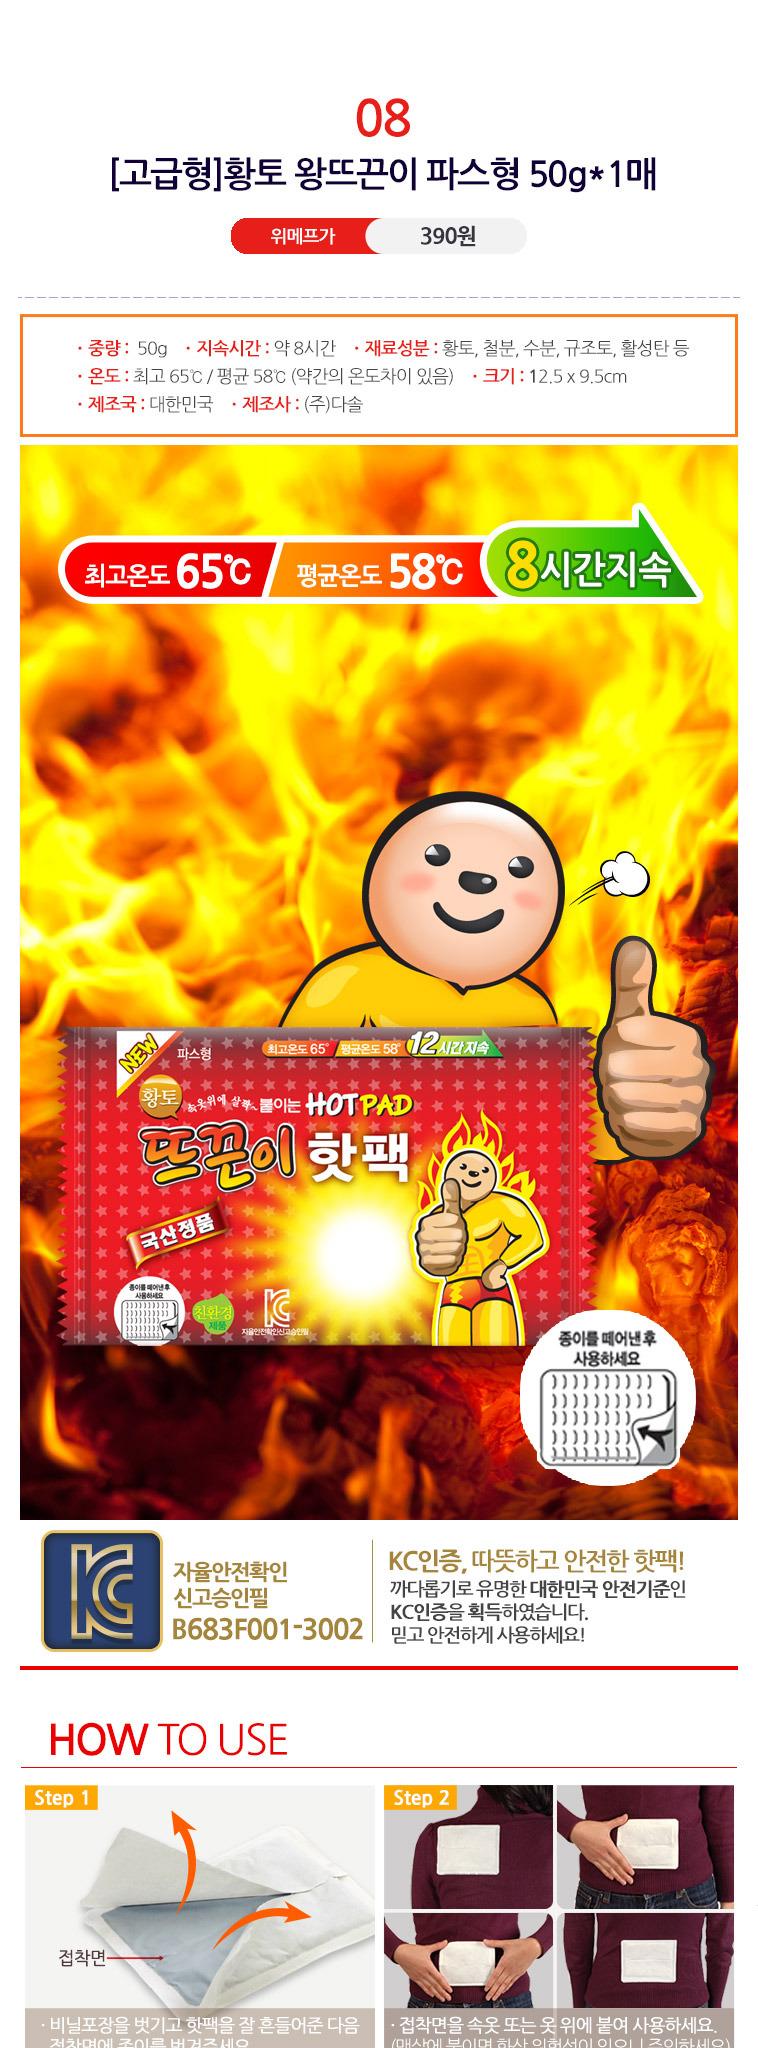 New 뜨끈이 핫팩 모음전 - 상세정보